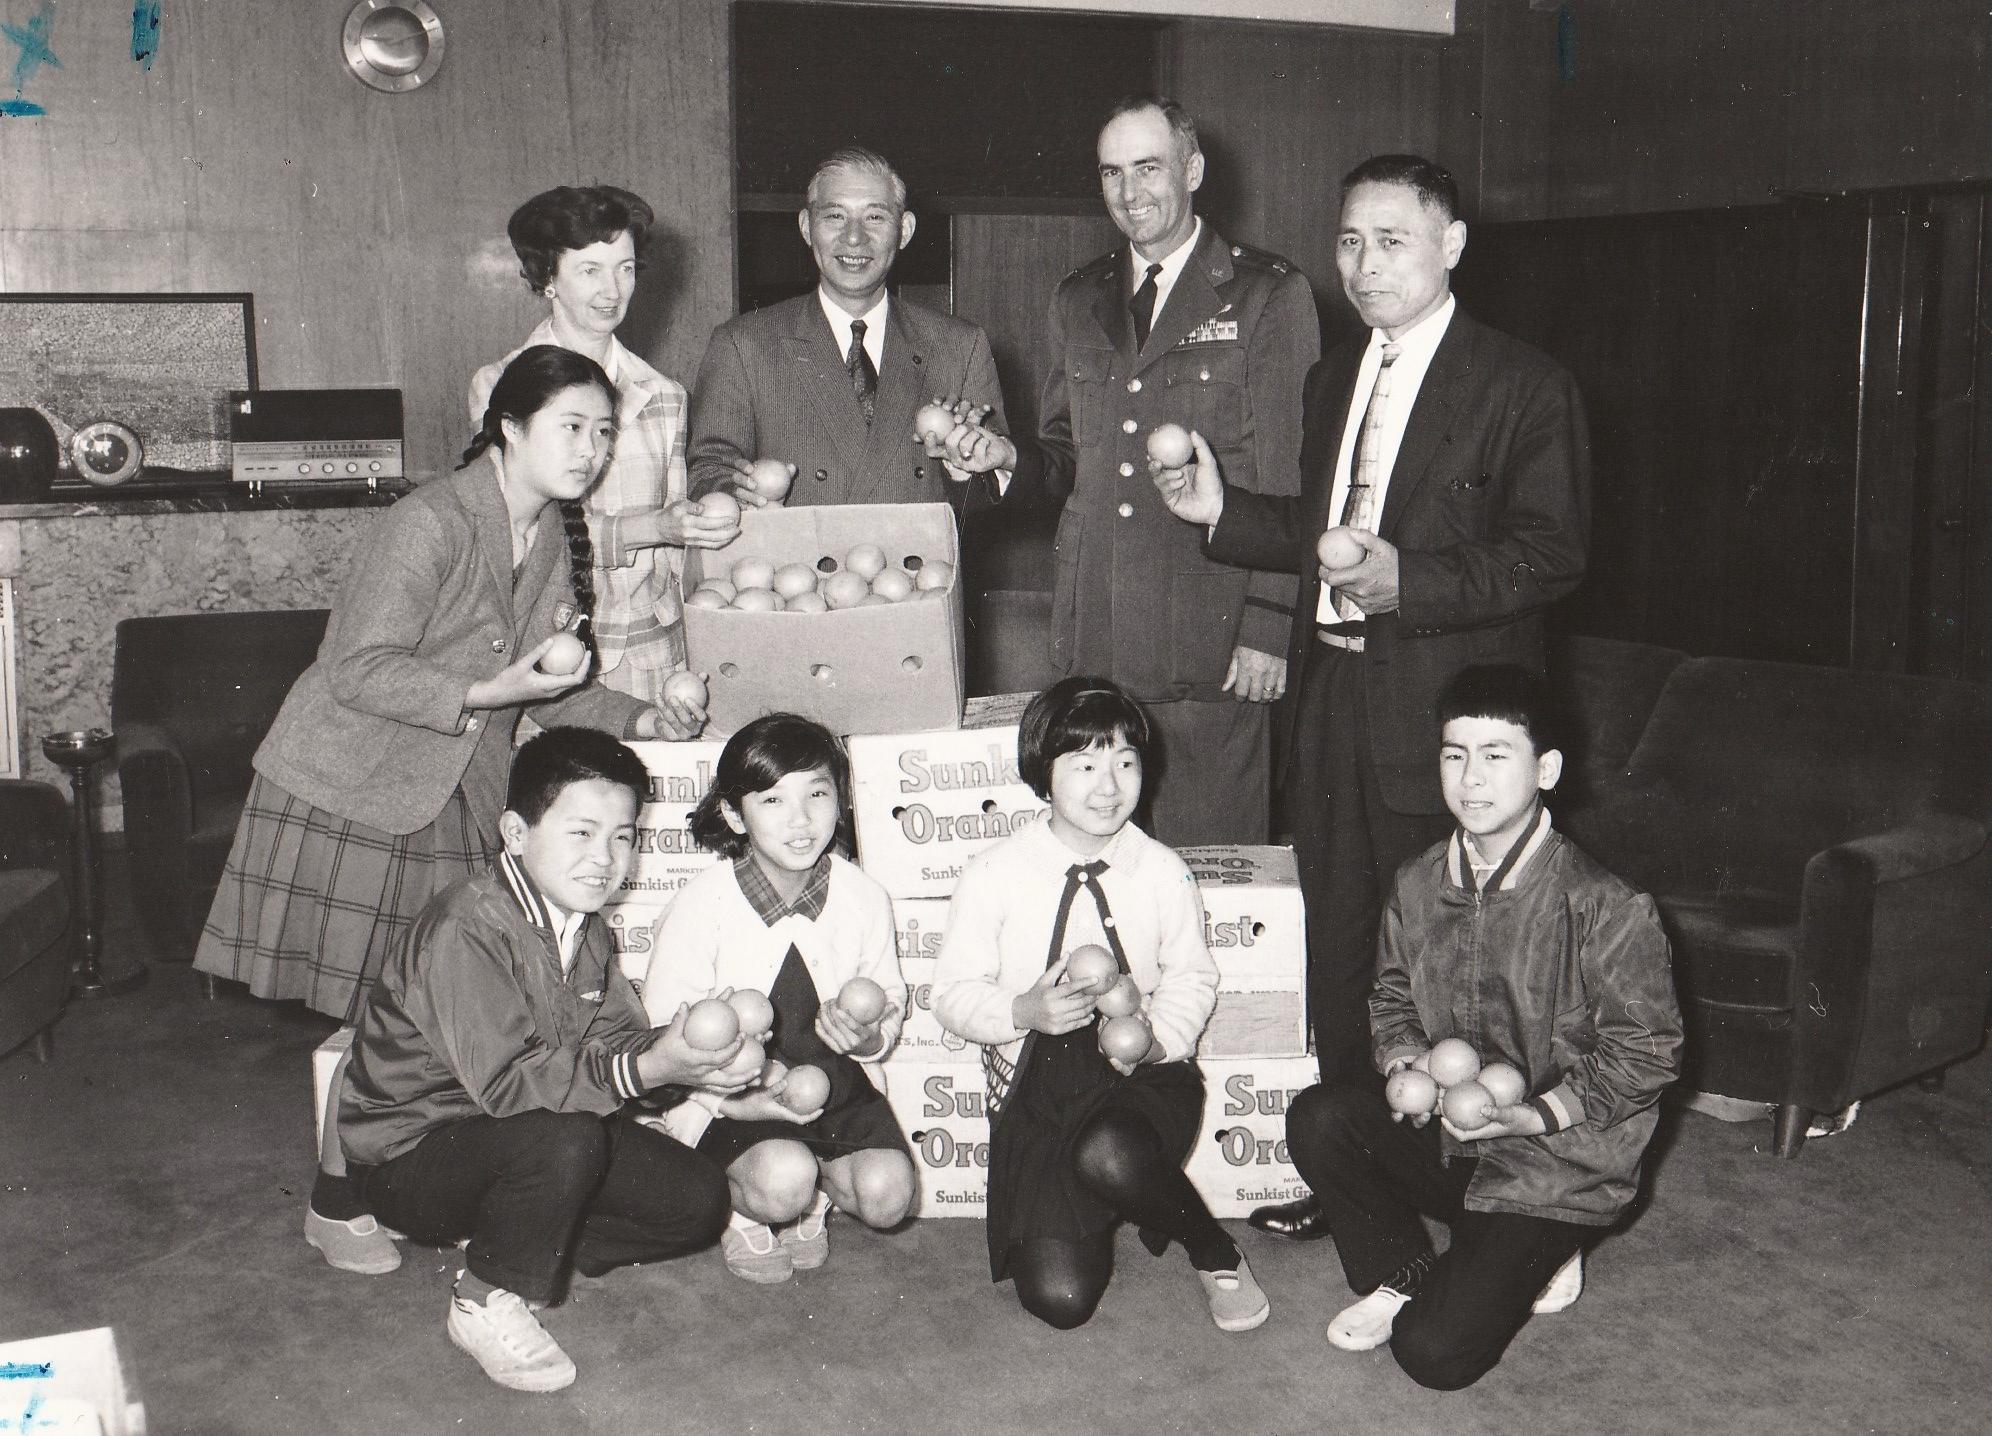 Japanese students and Tachikawa's Mayor Sakurai receiving naval oranges from   Mignon and Seymour Schweitzer.